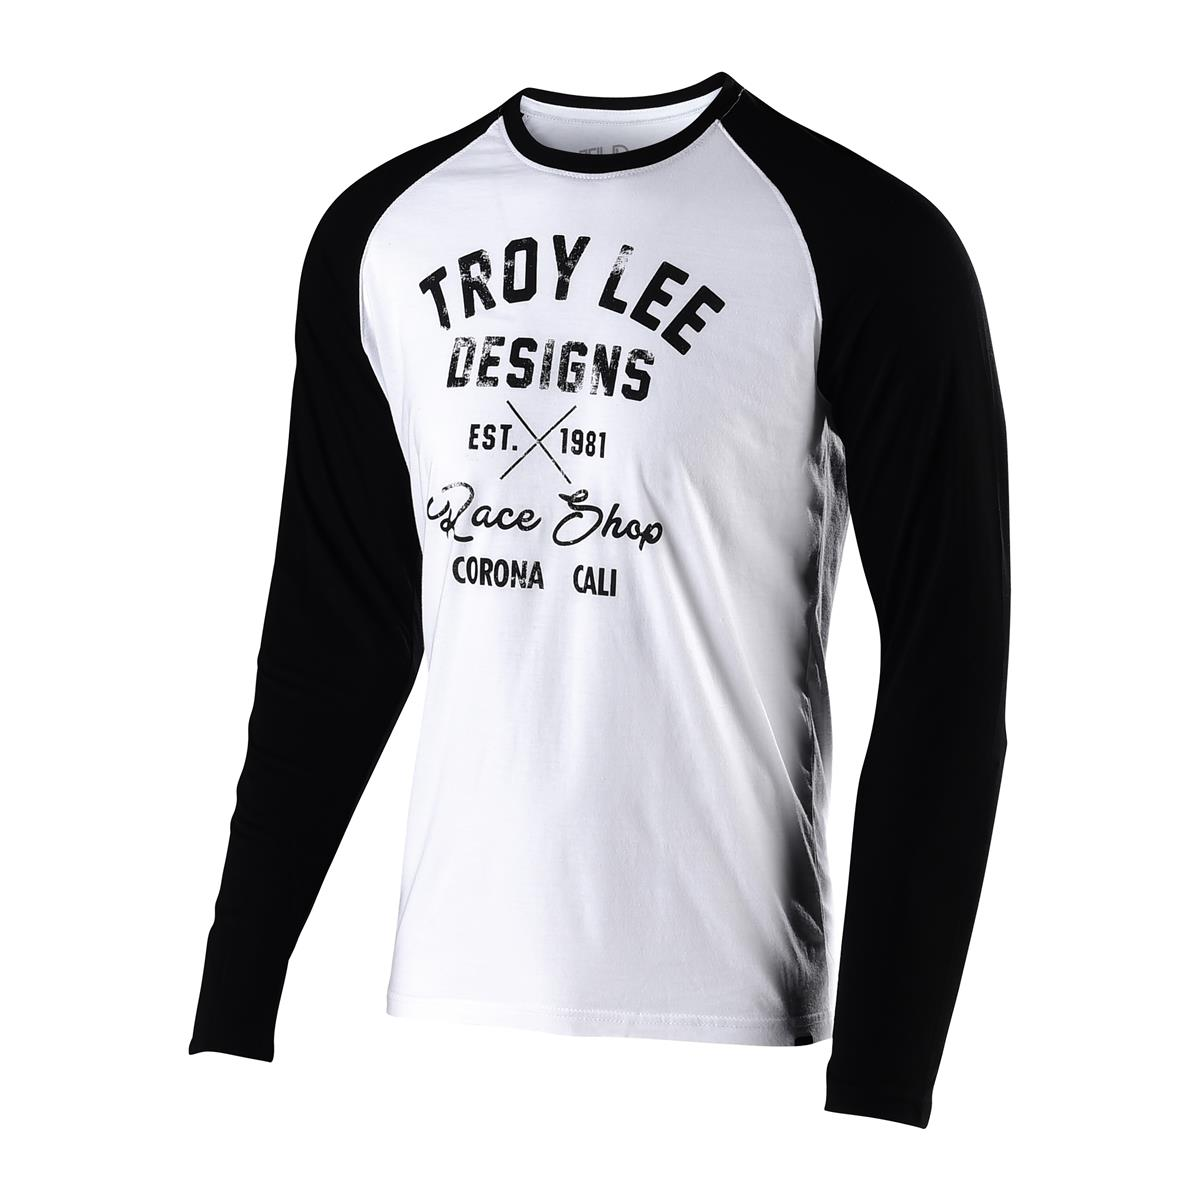 Troy Lee Designs Langarmshirt Vintage Race Shop Weiß/Schwarz